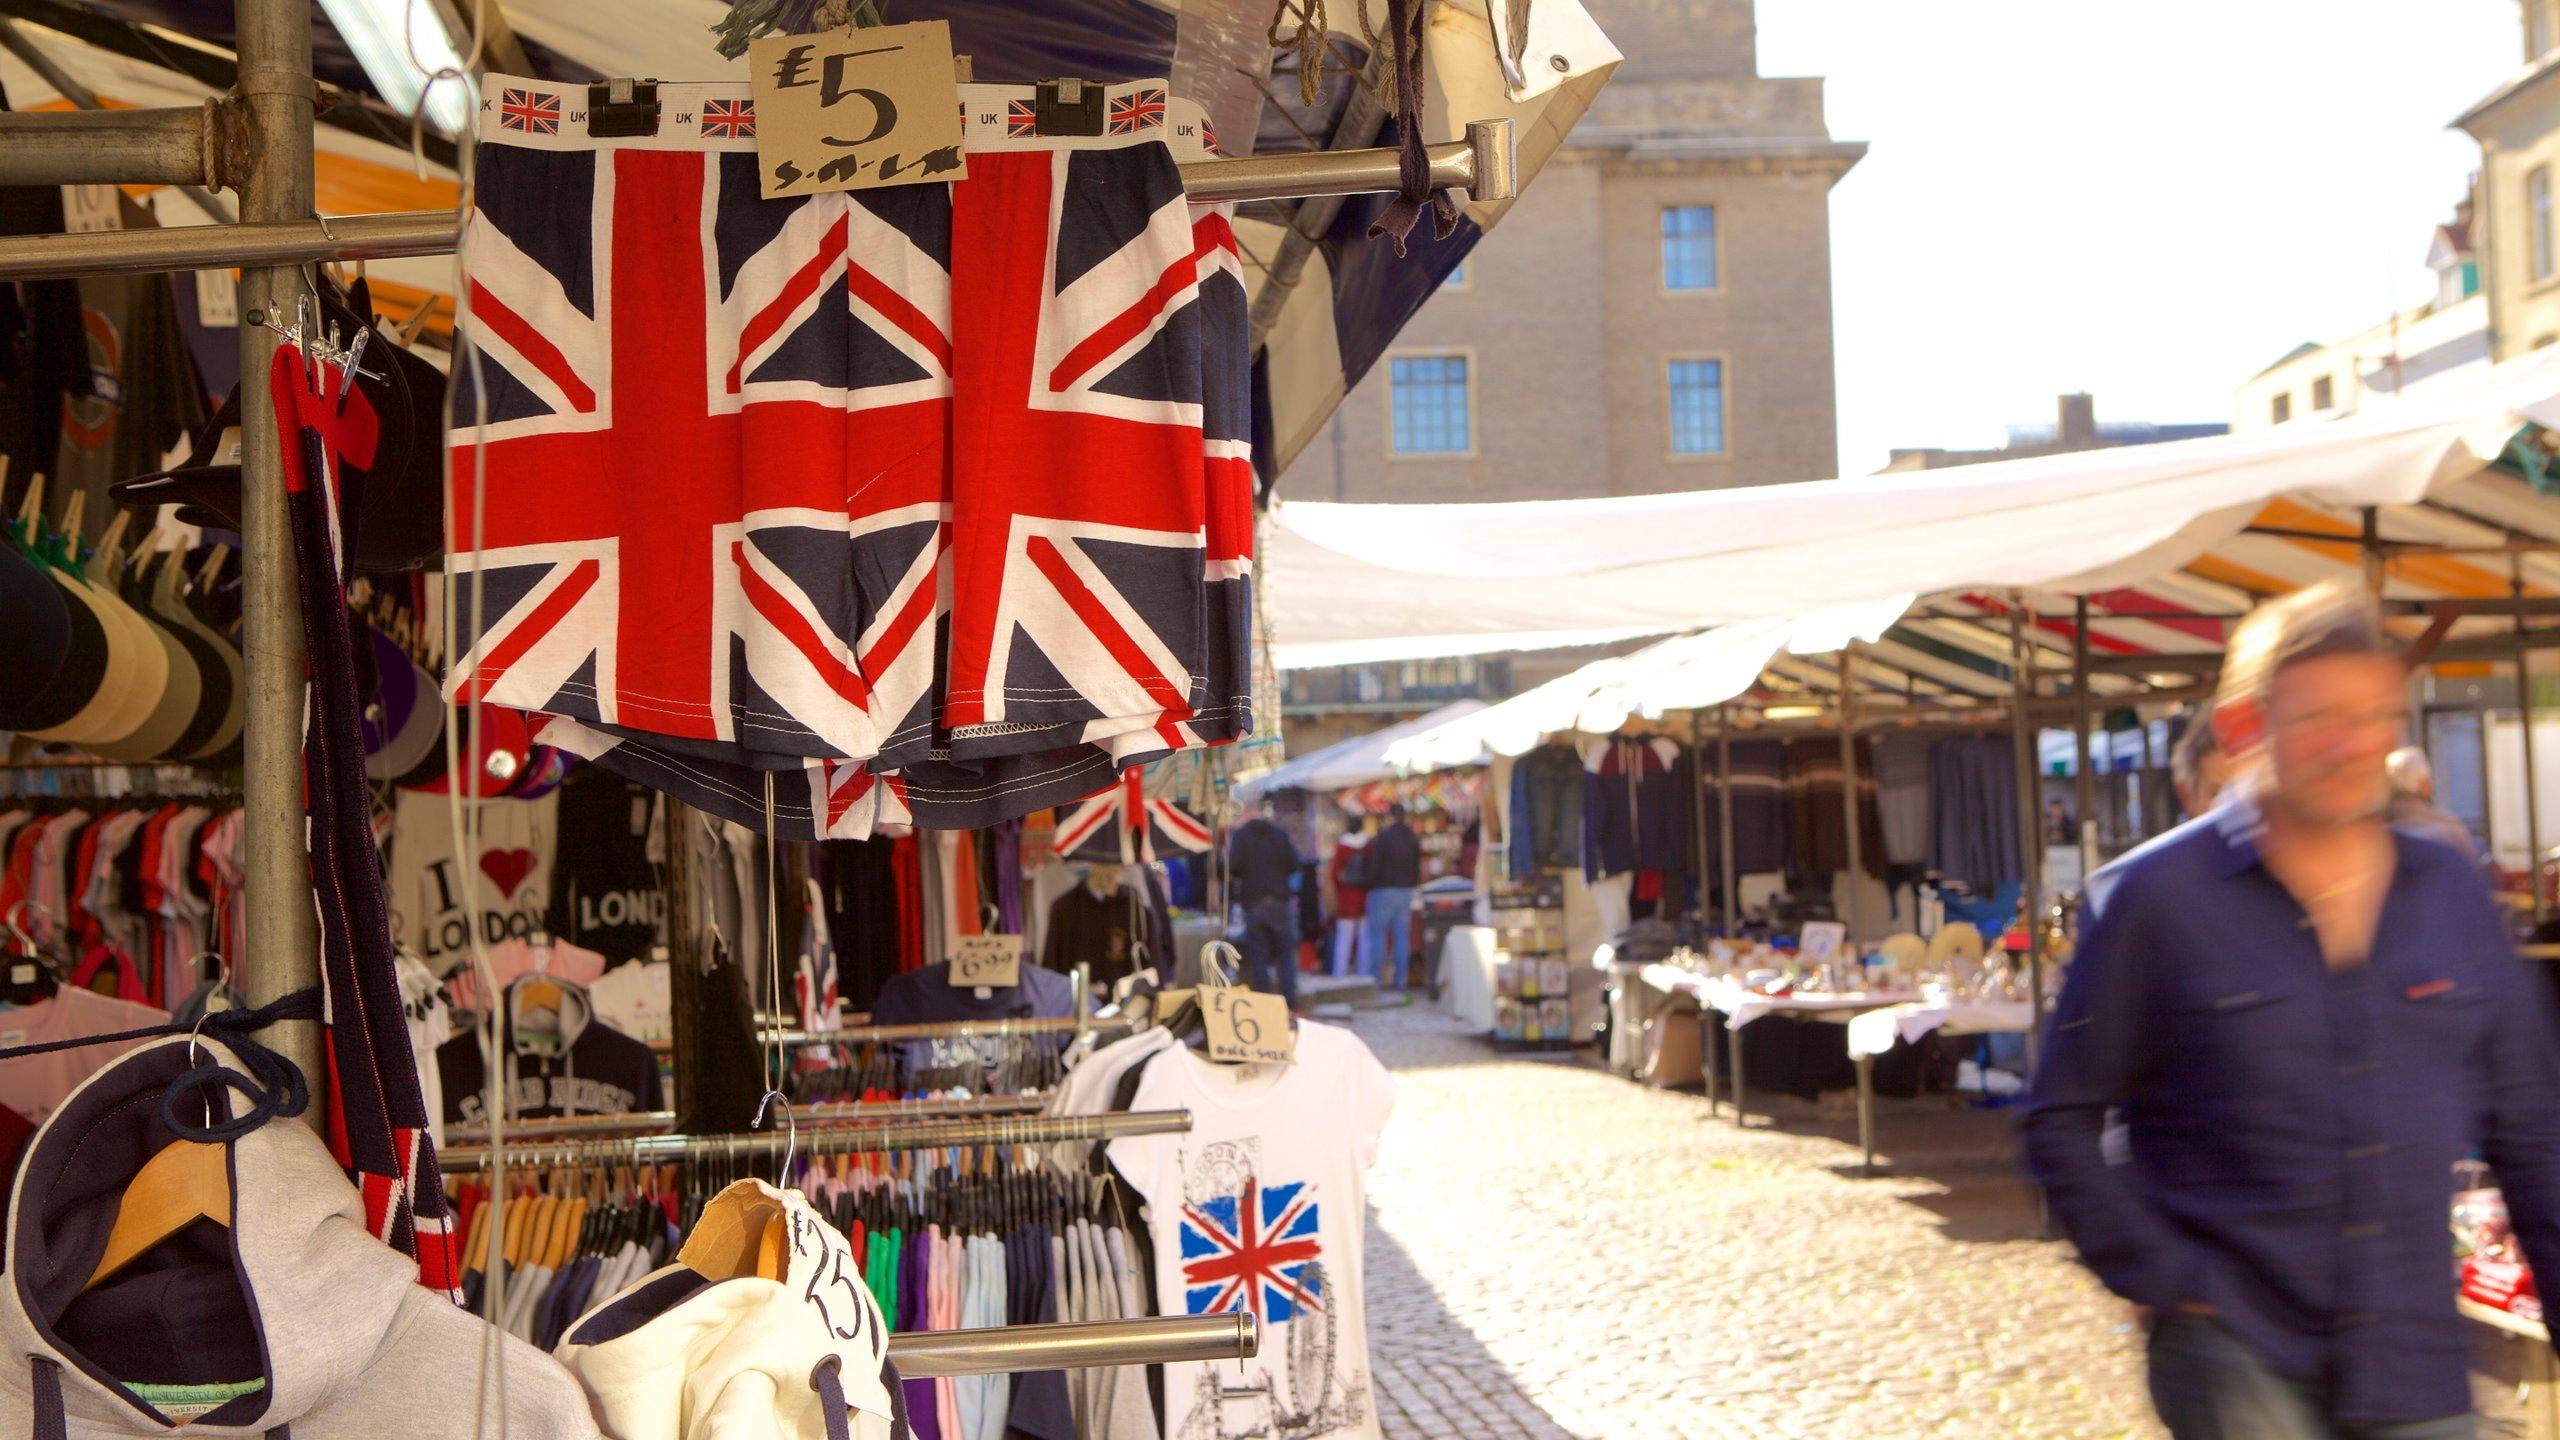 Cambridge Market Square, Cambridge, England, United Kingdom